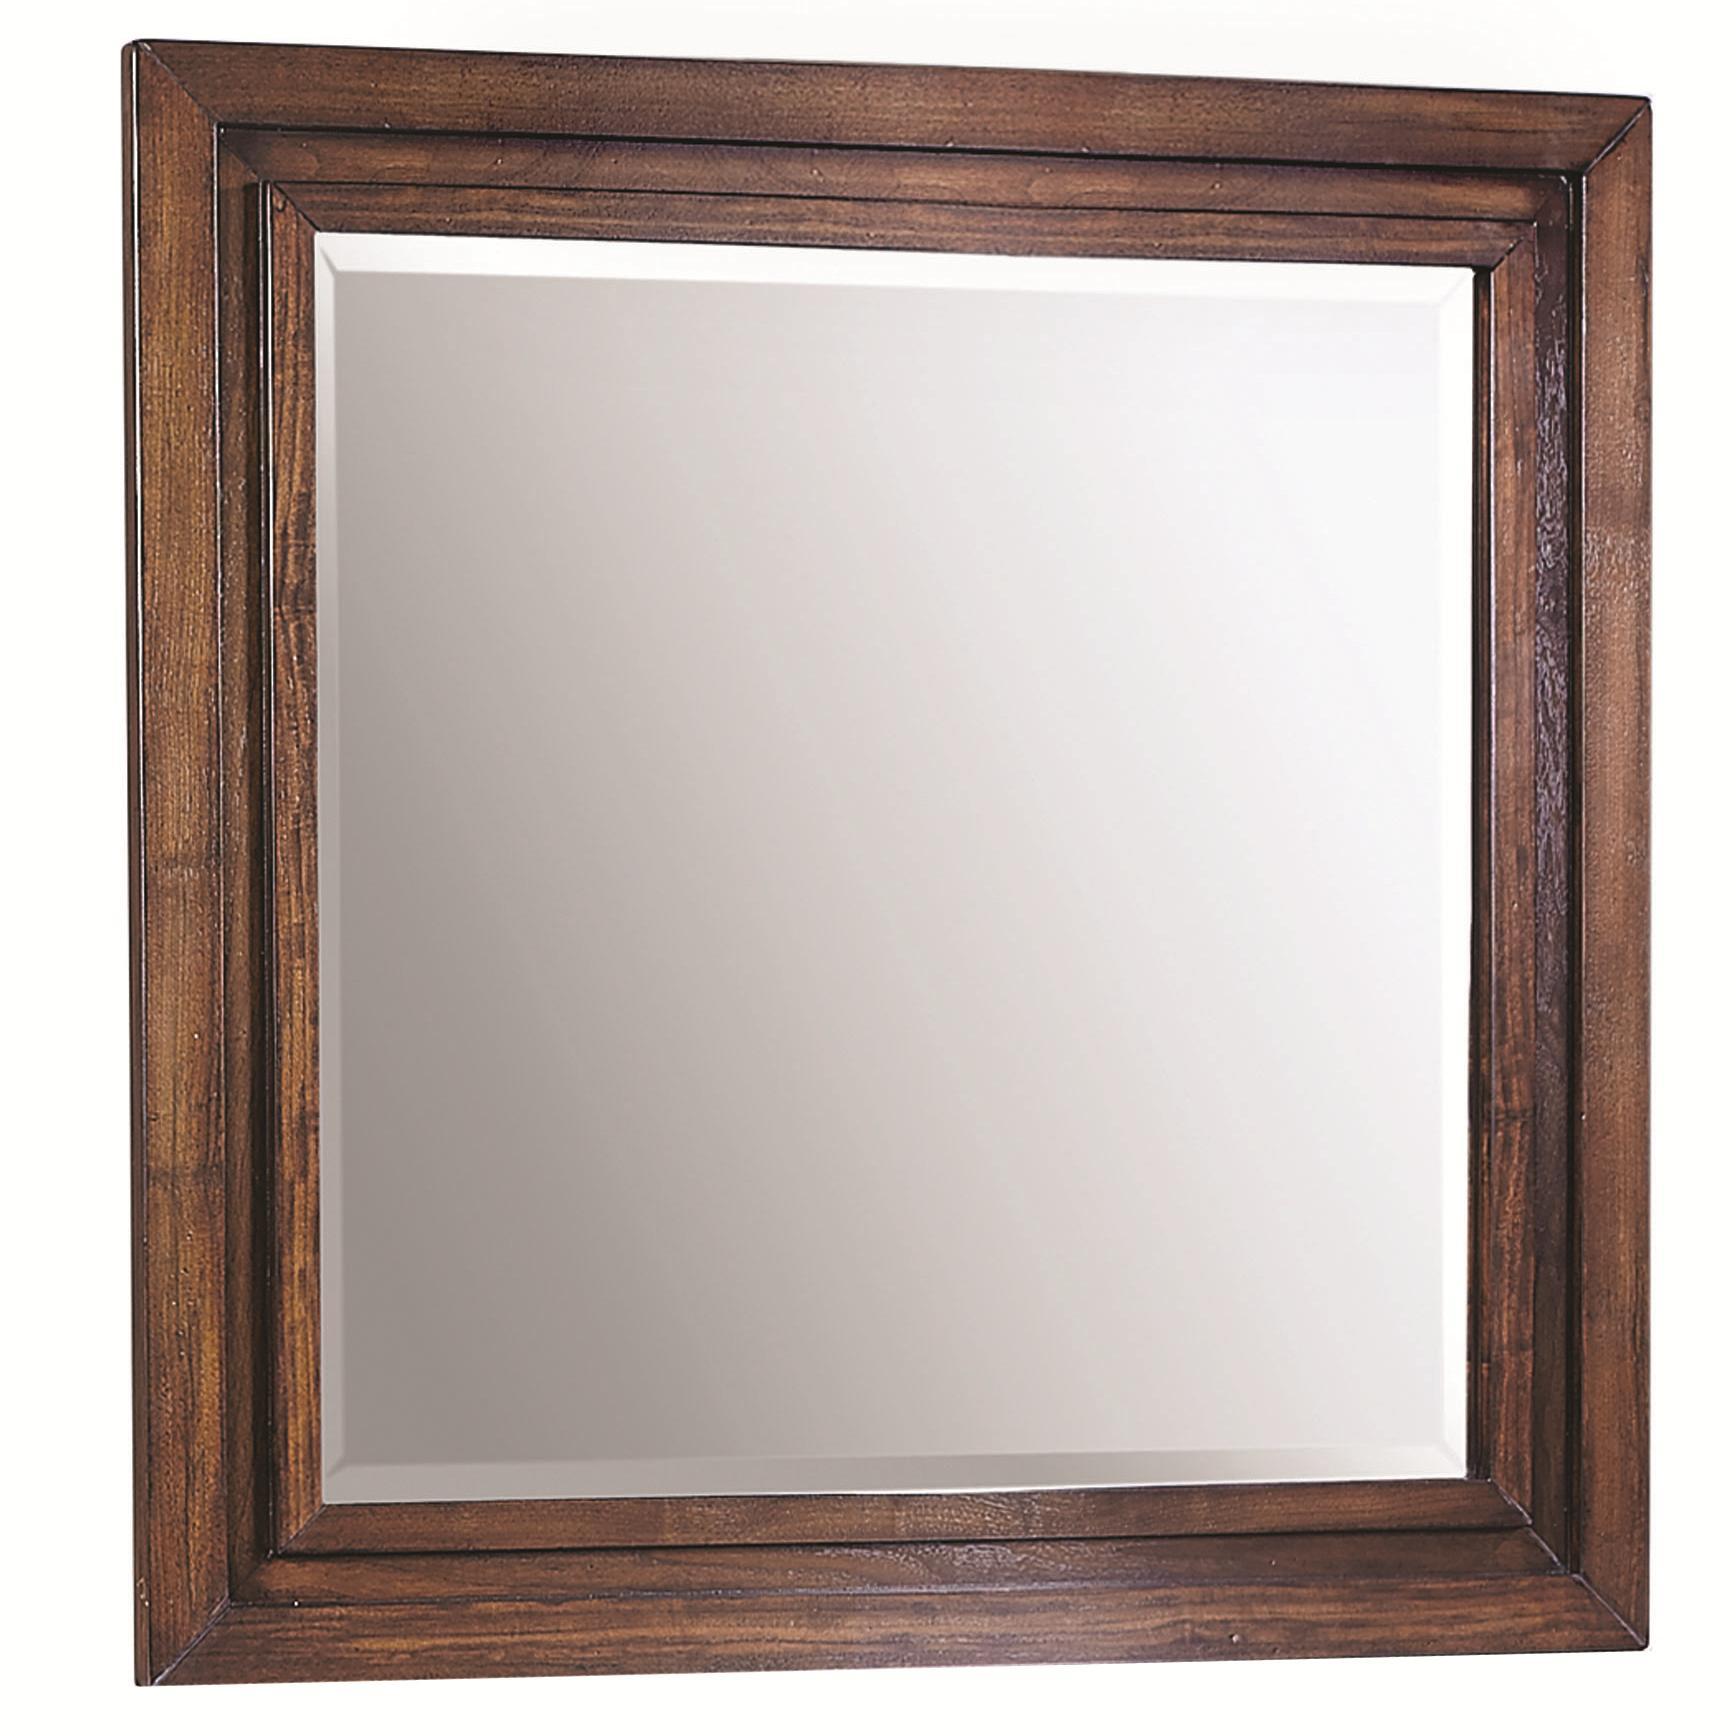 Aspenhome Walnut Park Square Mirror - Item Number: I05-463